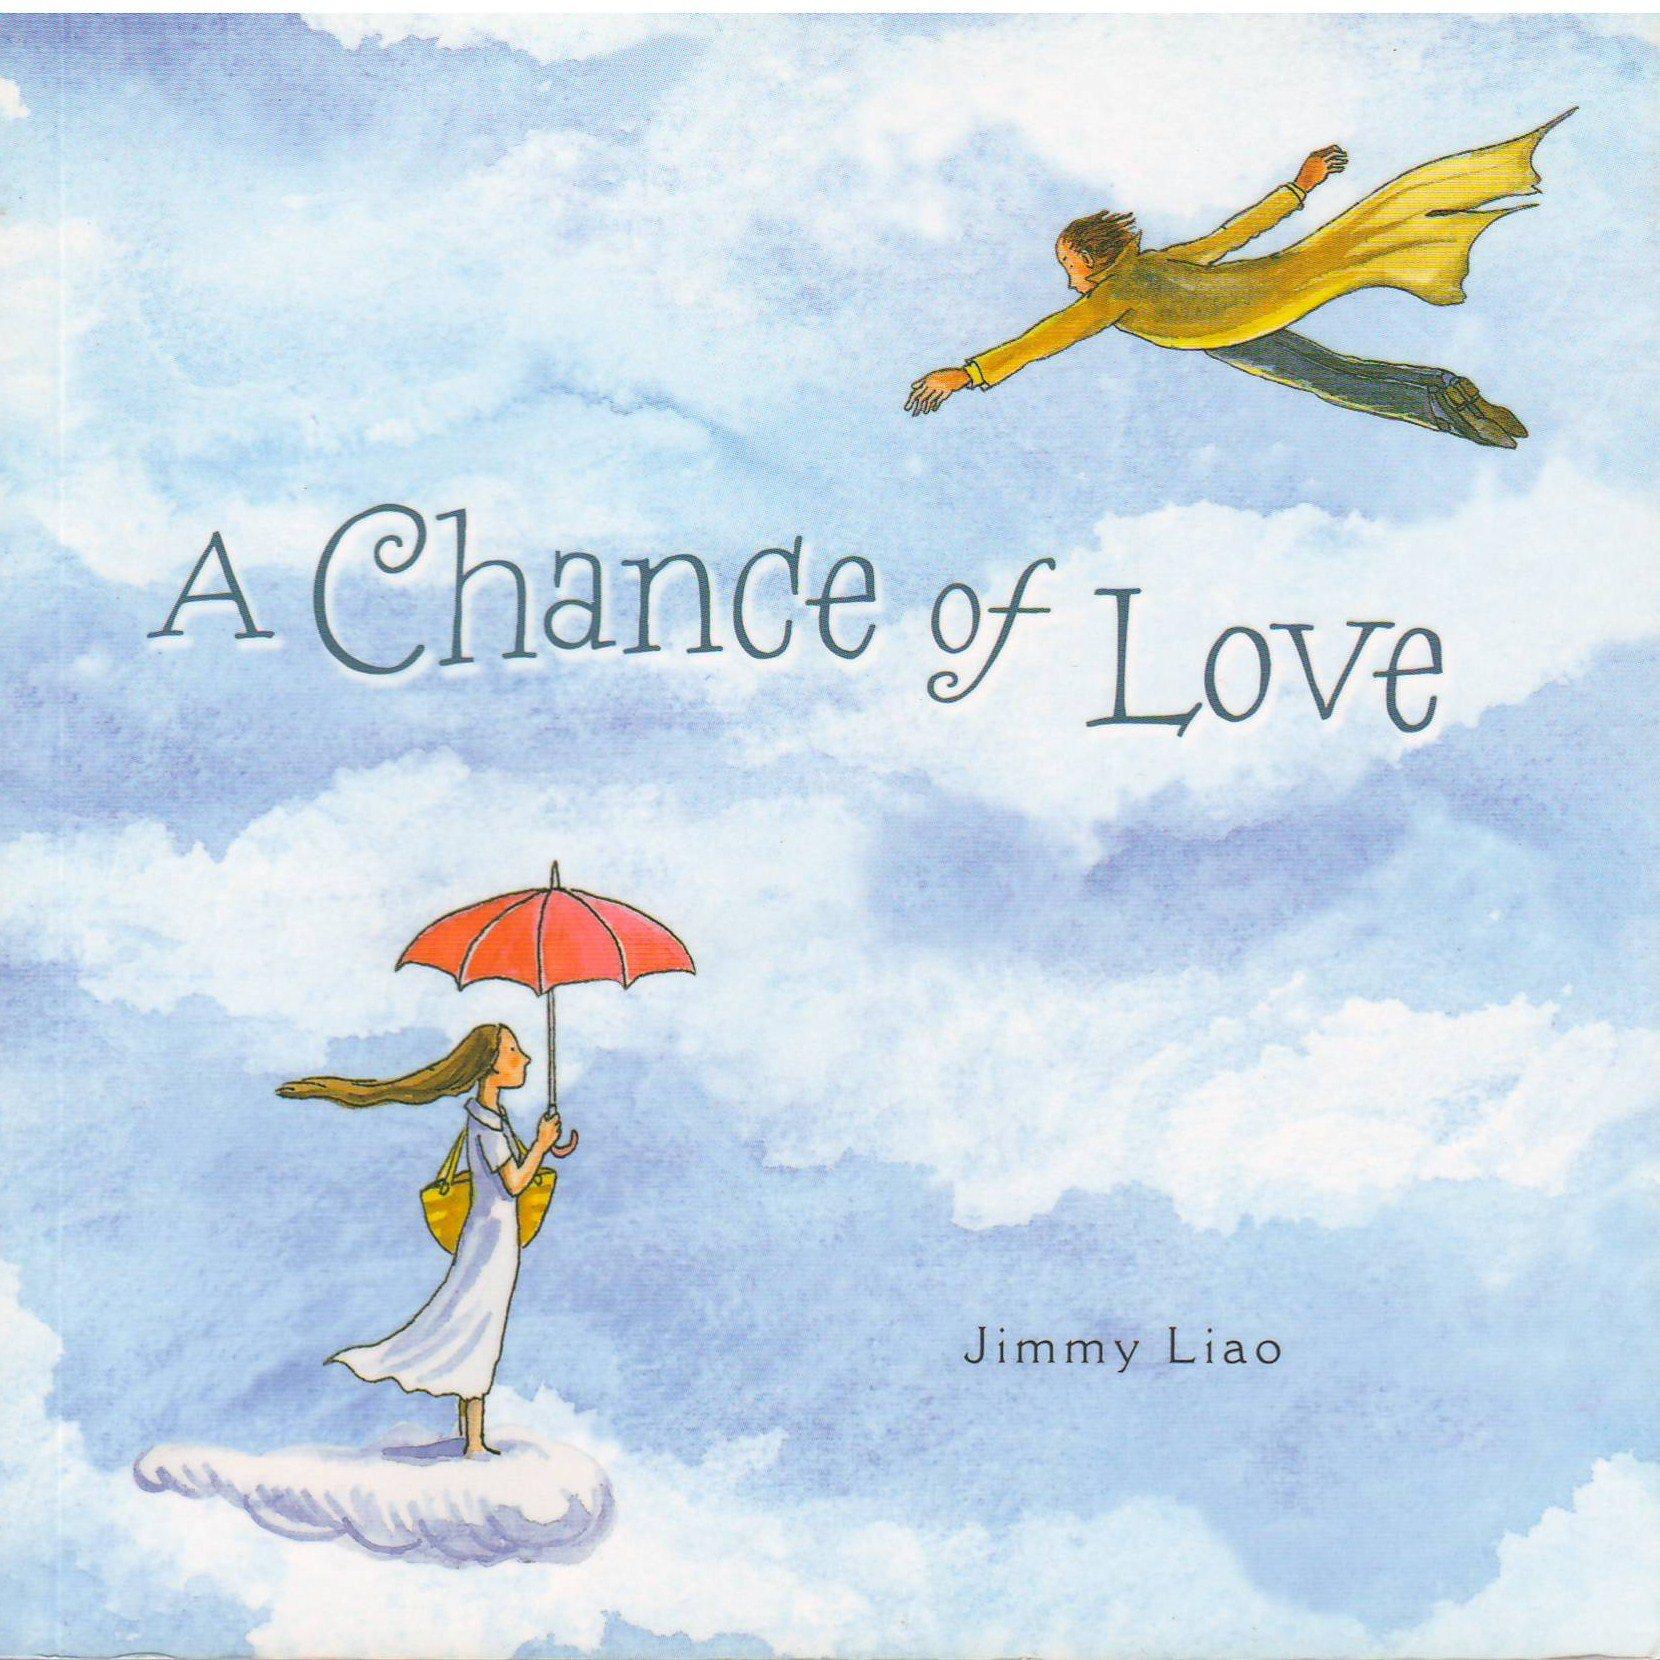 A CHANCE OF SUNSHINE JIMMY LIAO PDF DOWNLOAD